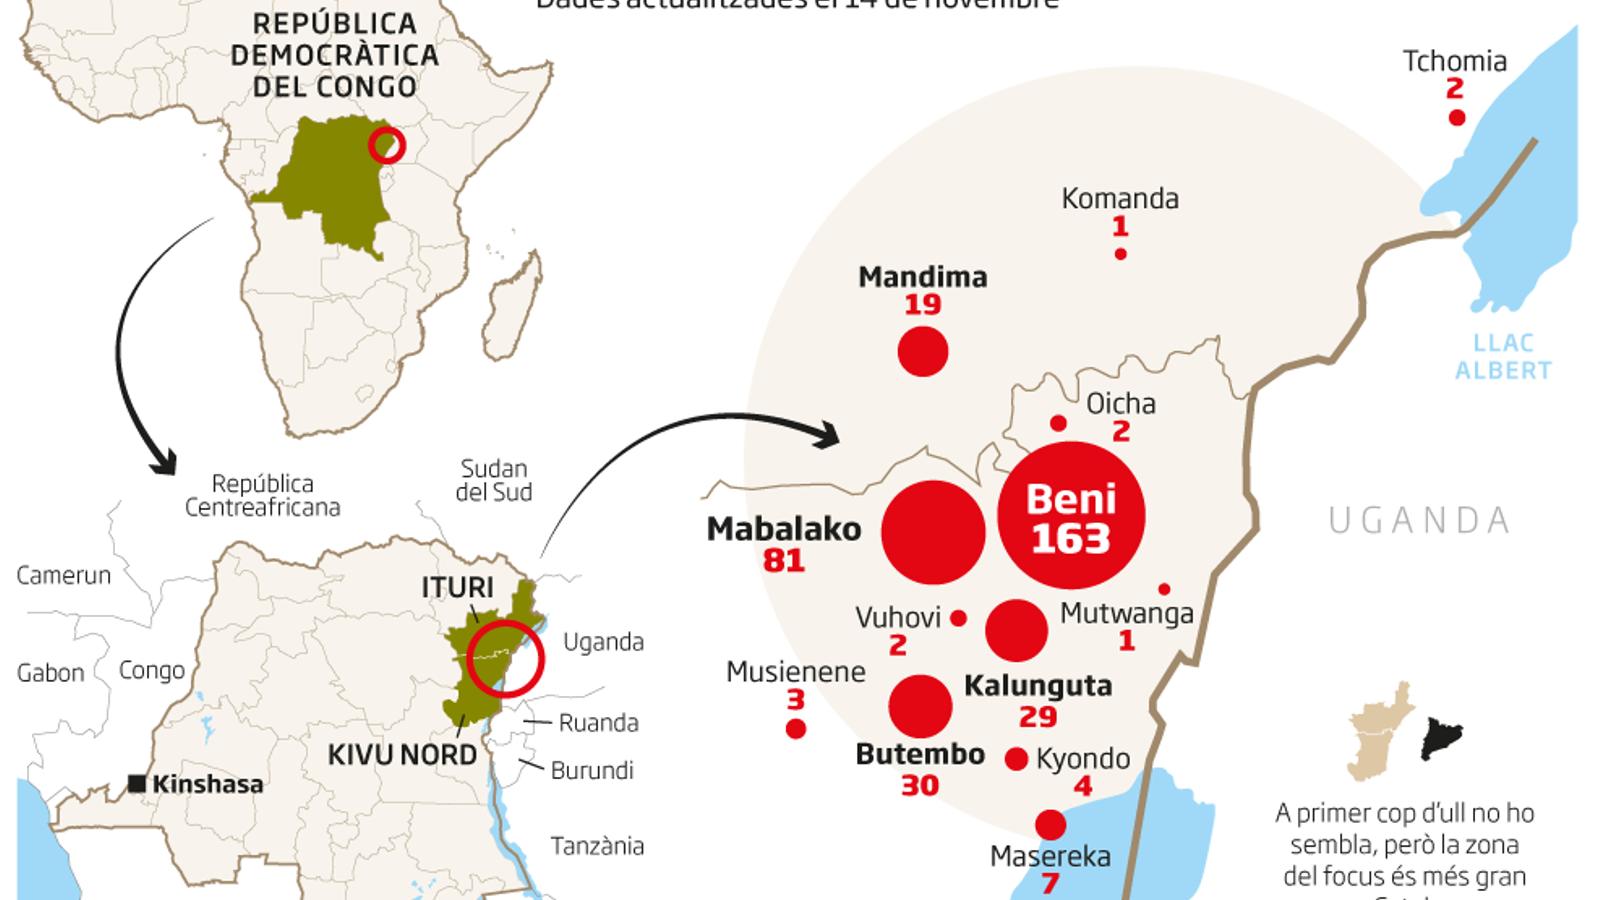 Un nou focus d'Ebola al centre de l'Àfrica